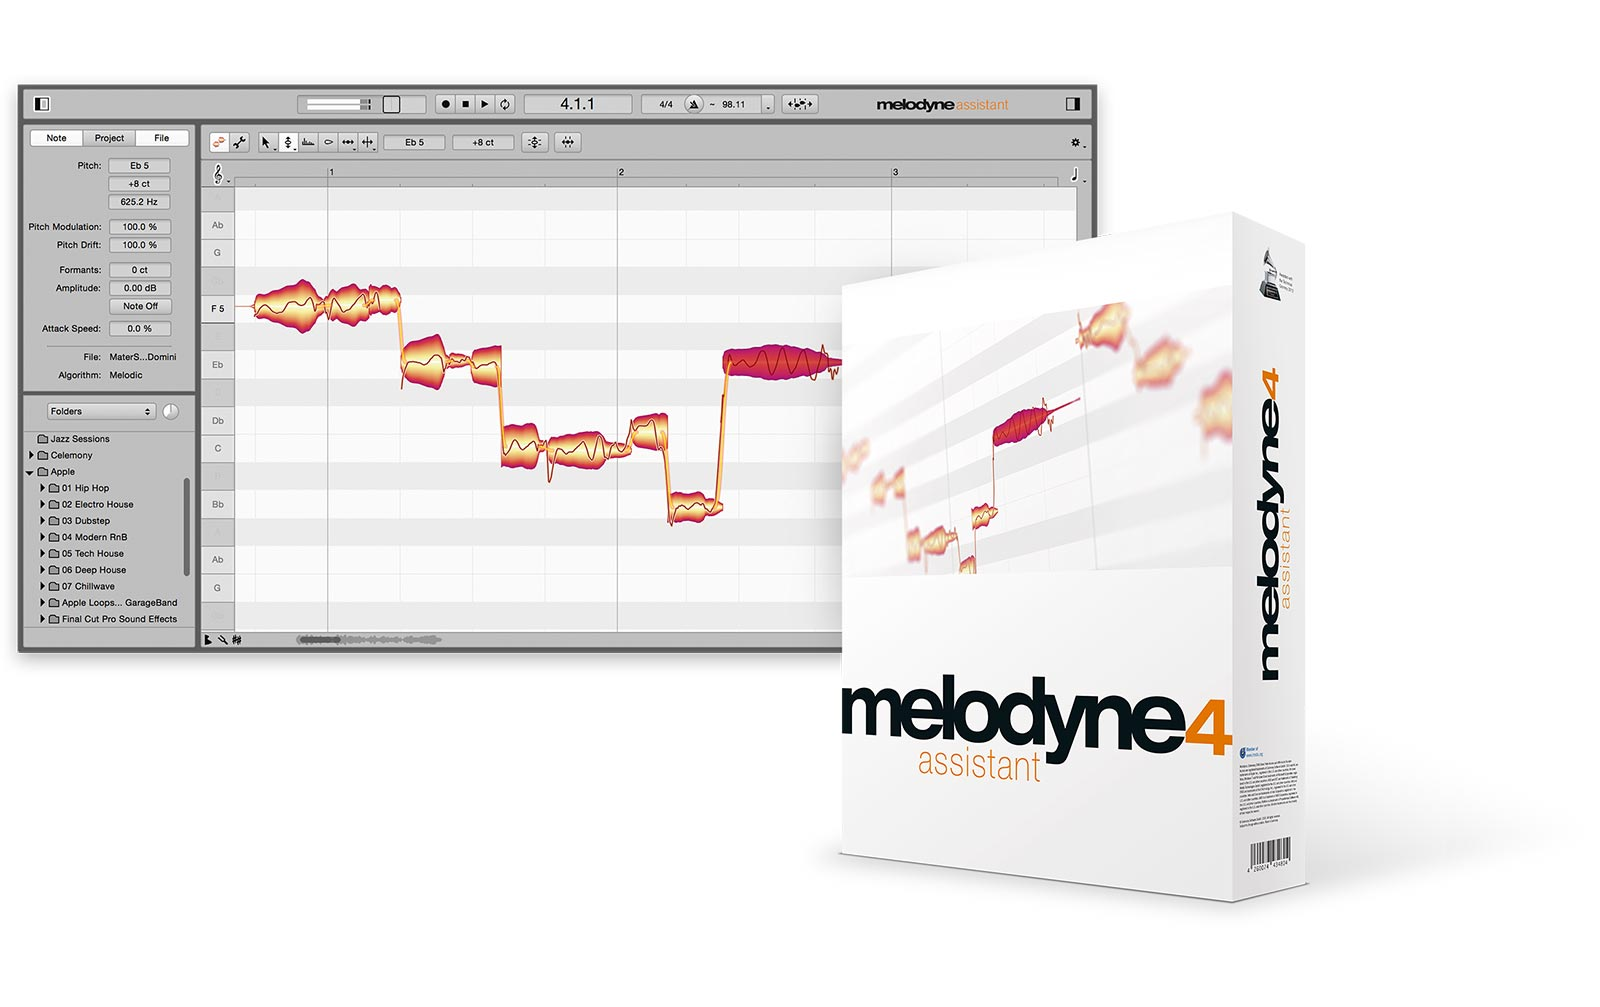 celemony-melodyne-4-assistant-upgrade-von-melodyne-essential